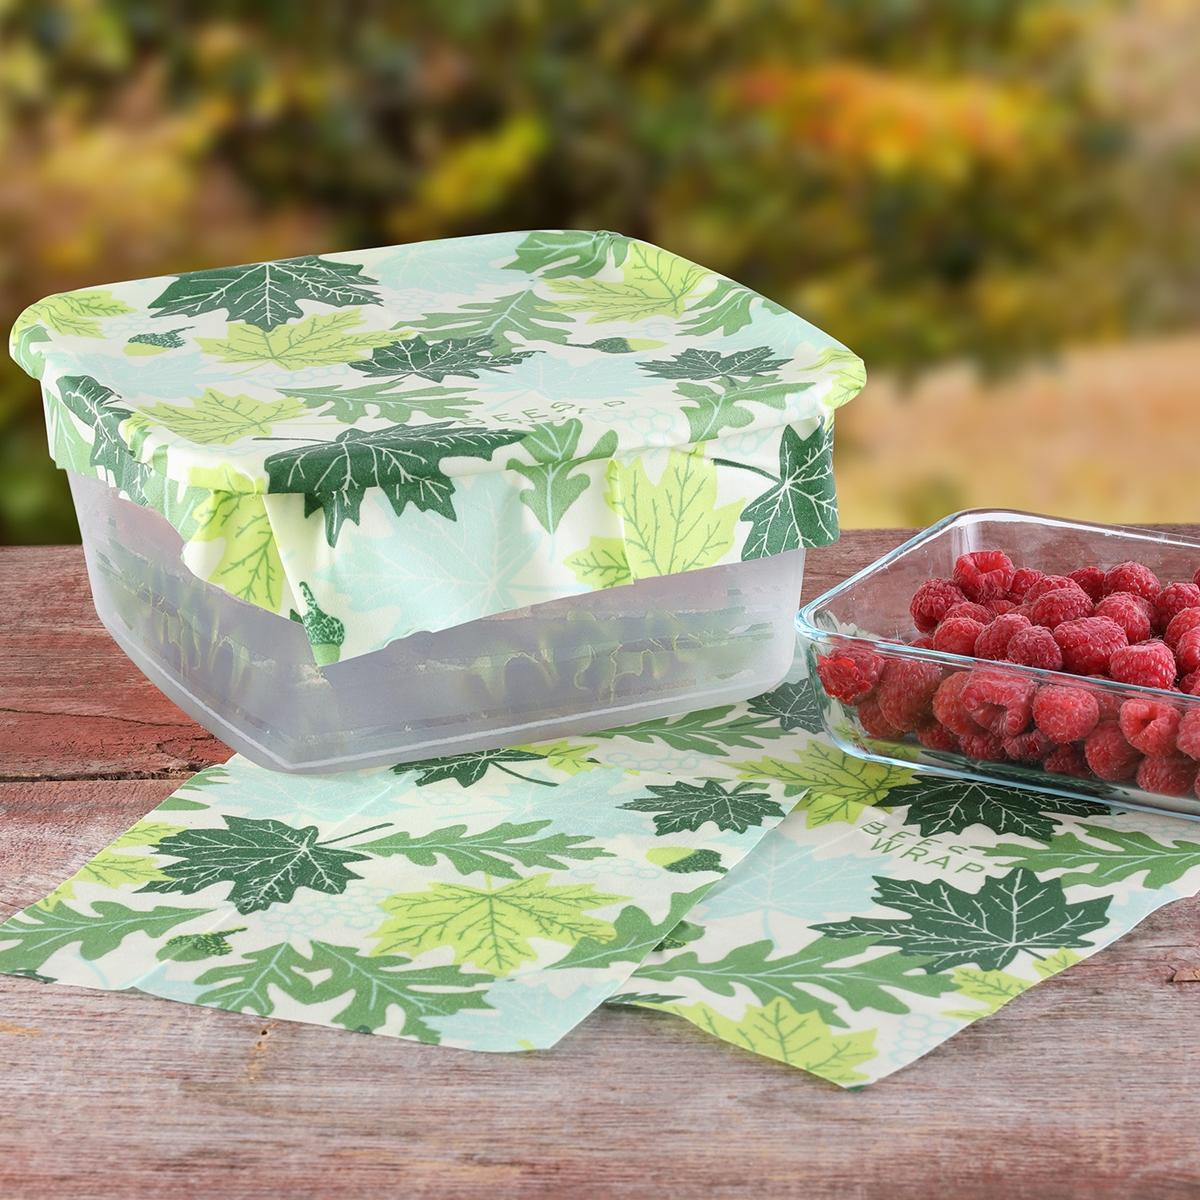 Forest Floor Reusable Food Wraps